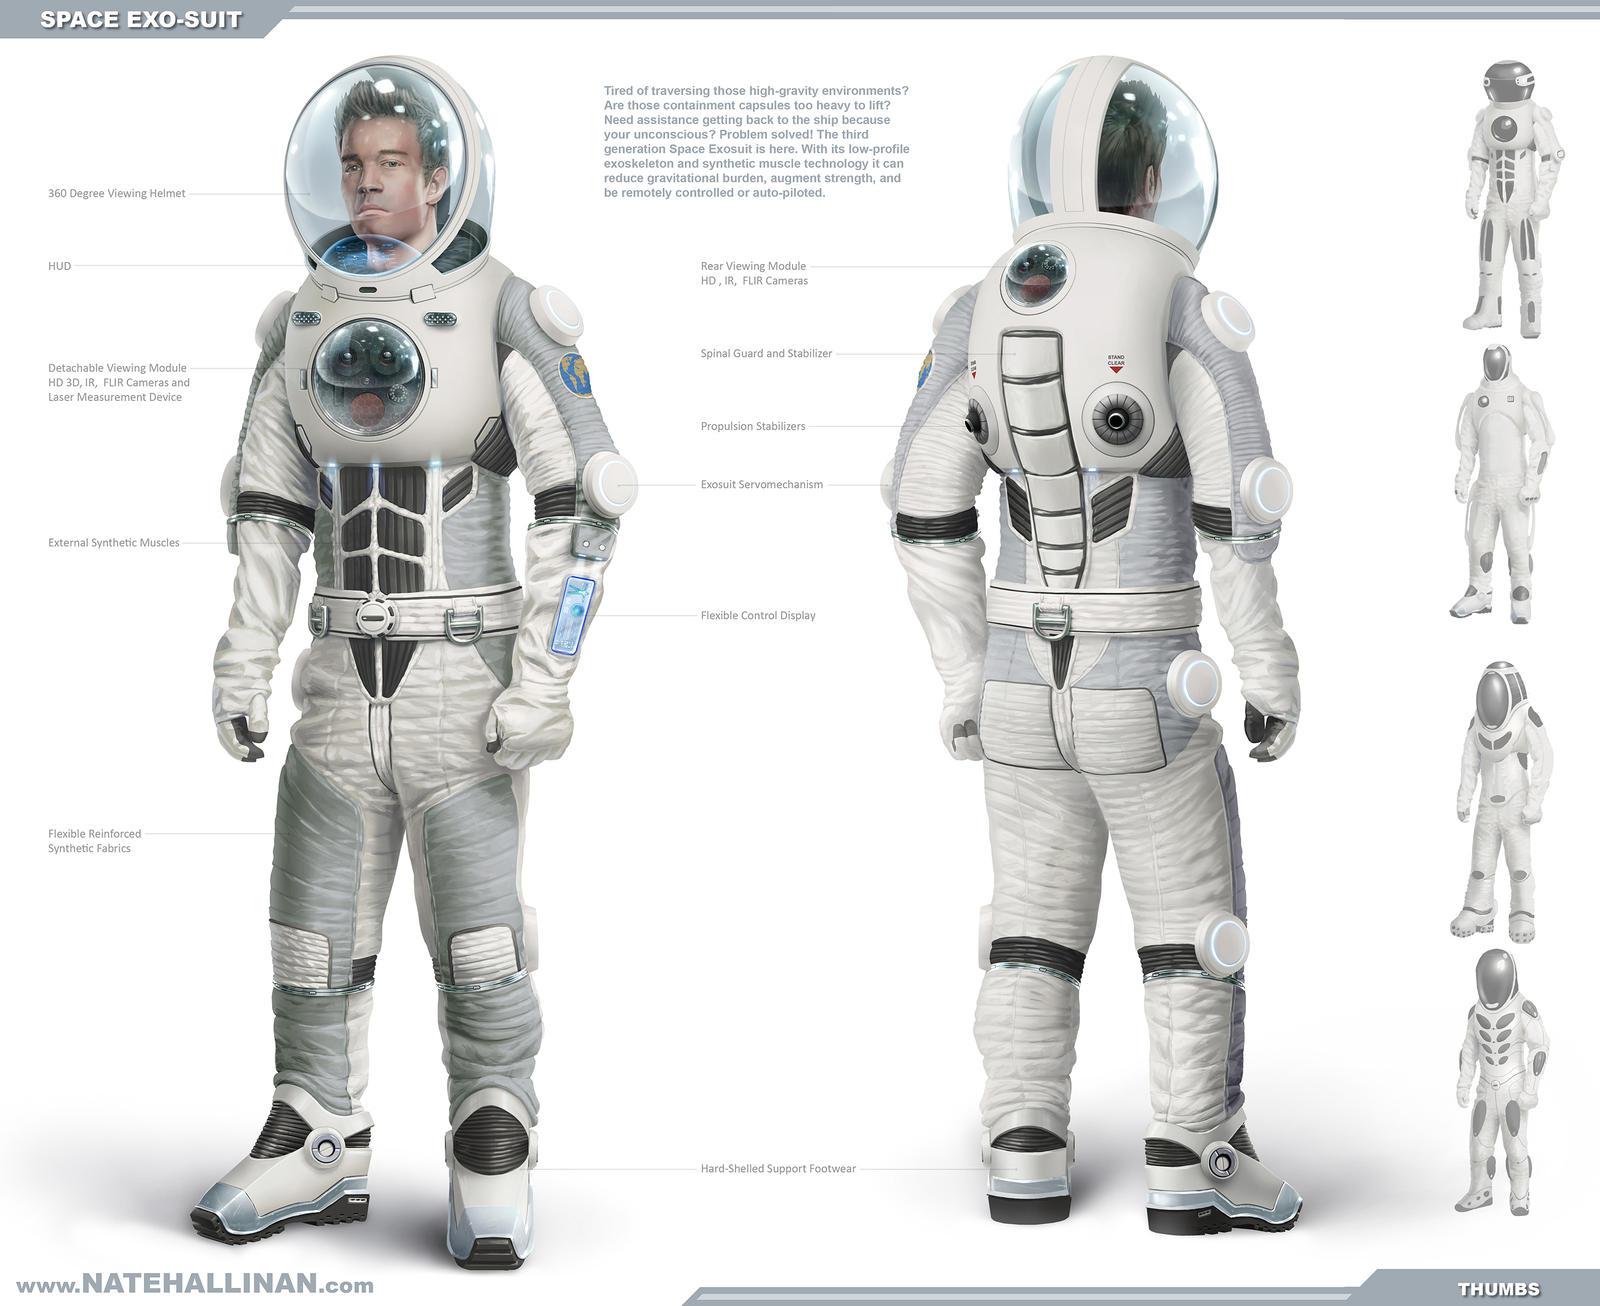 Space Exosuit